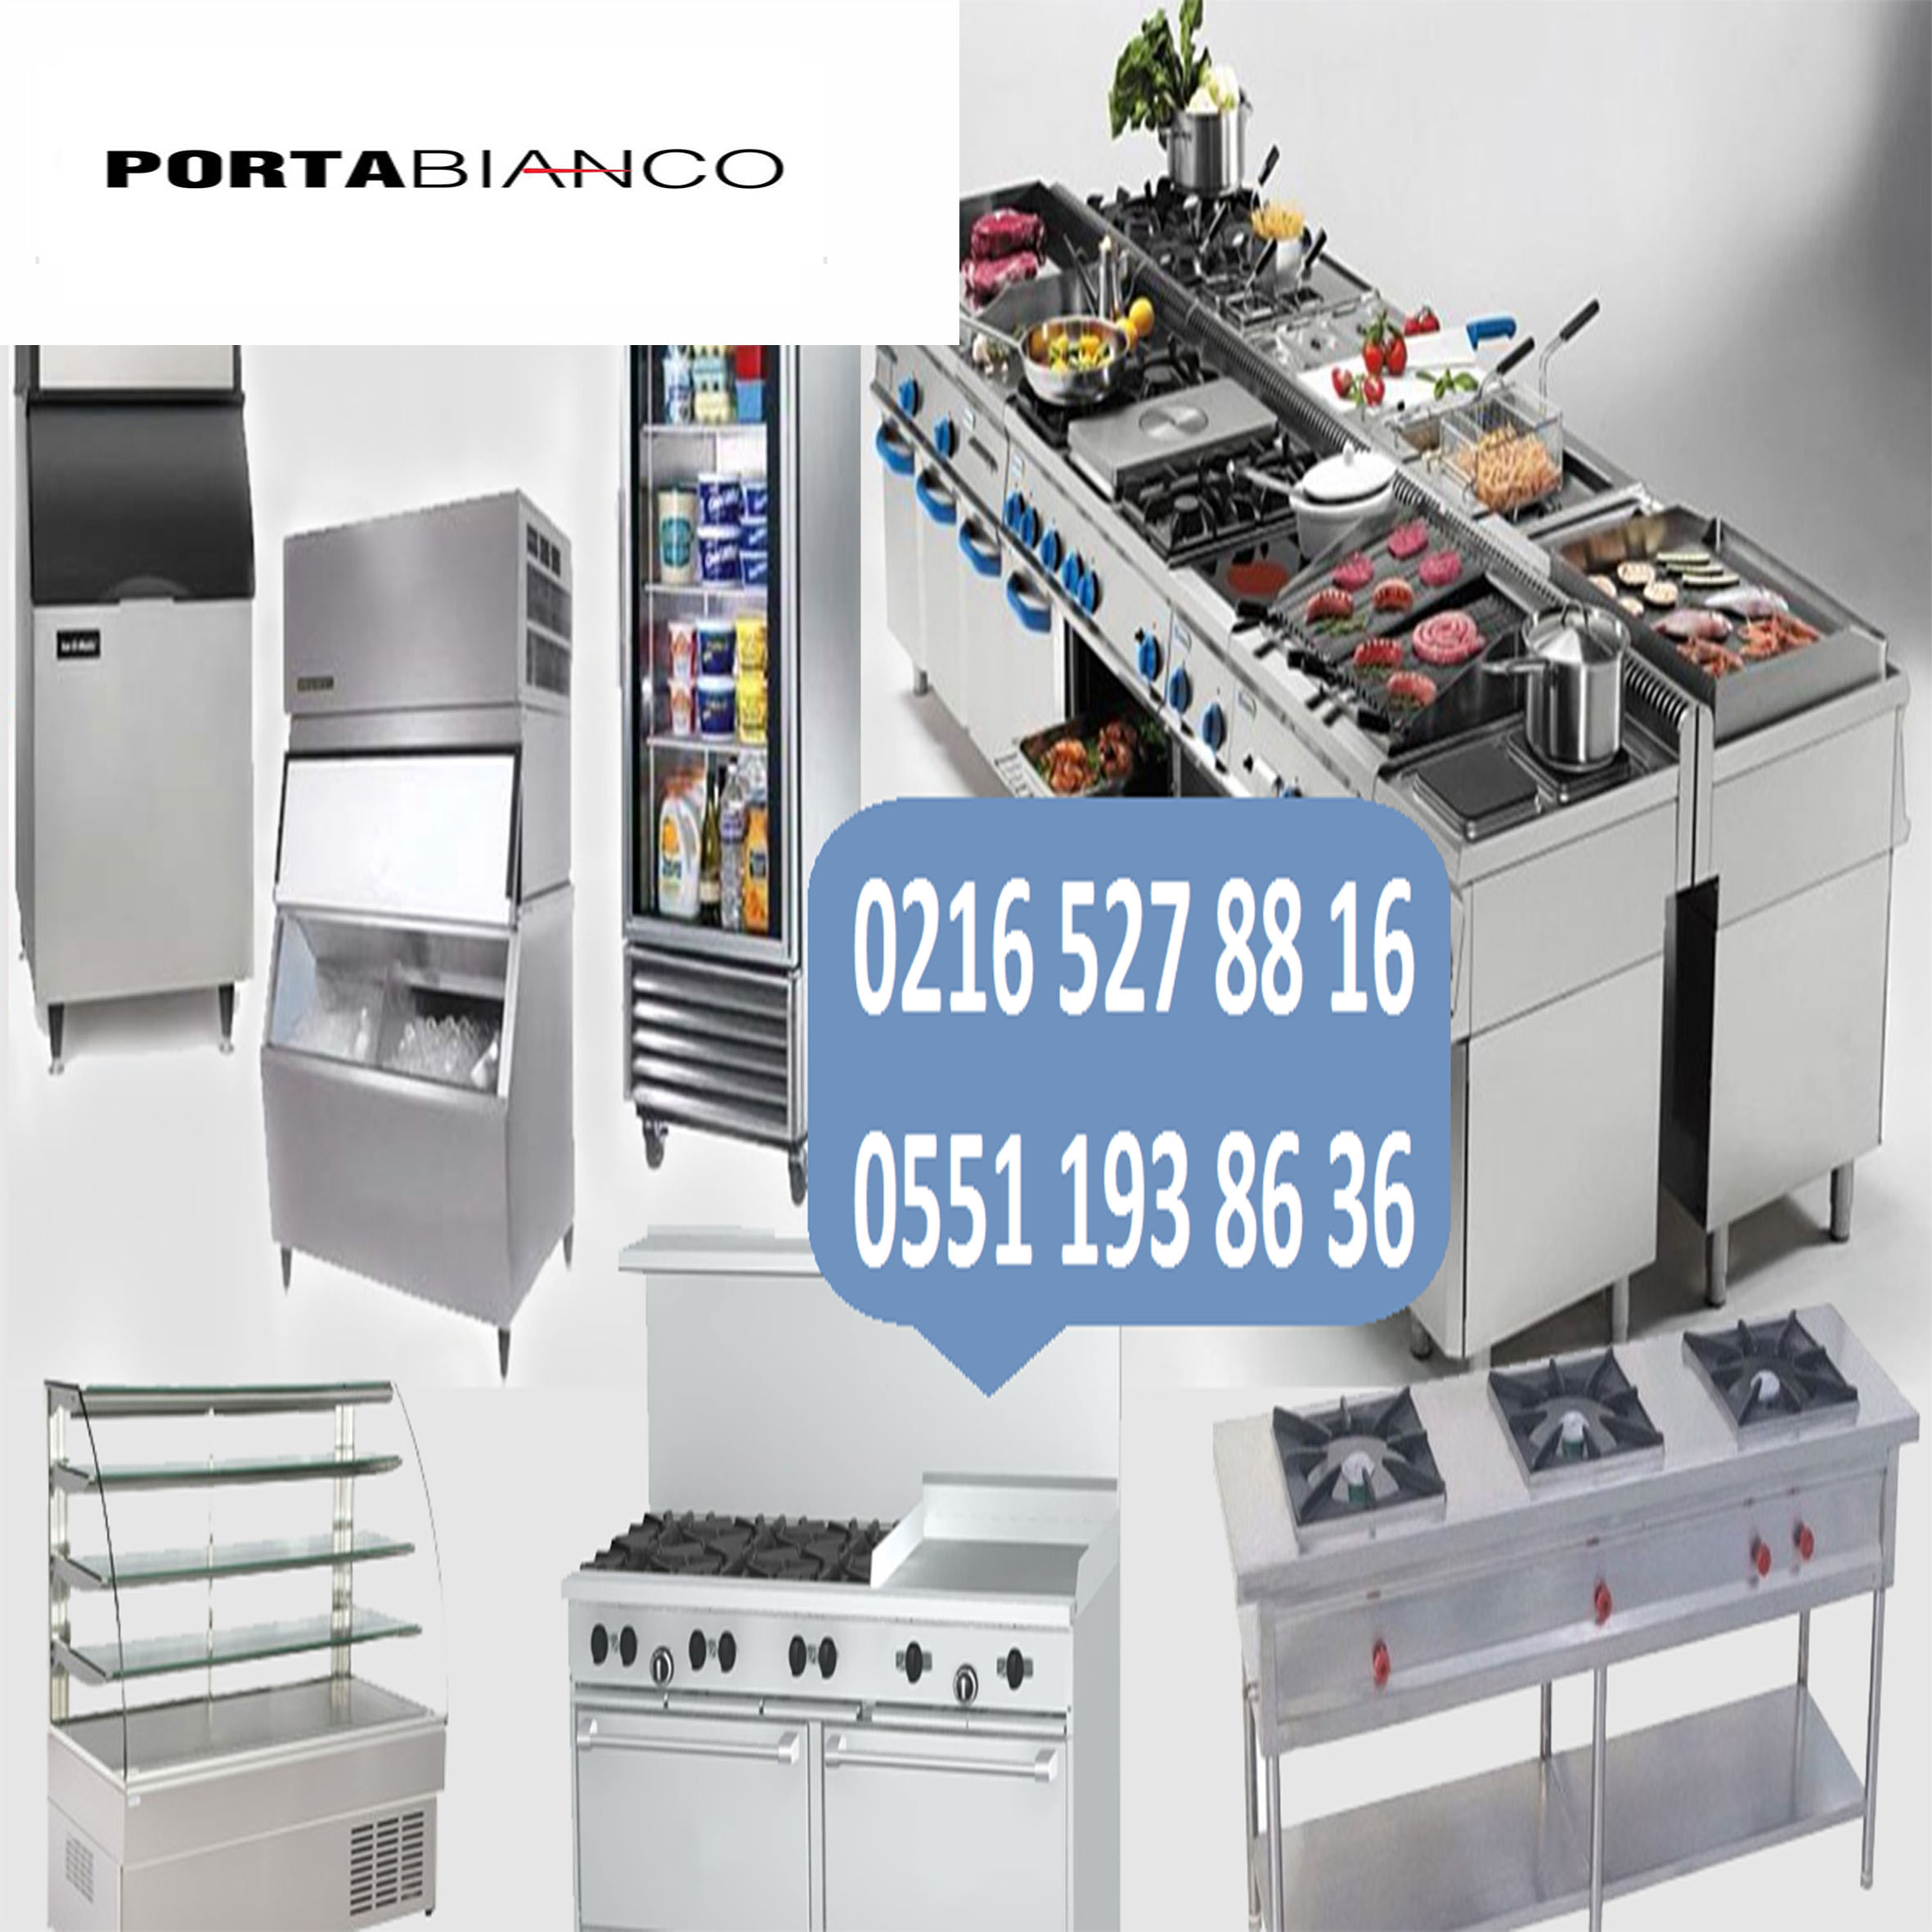 Kadıköy Portabianco Bulaşık Makinesi Servisi